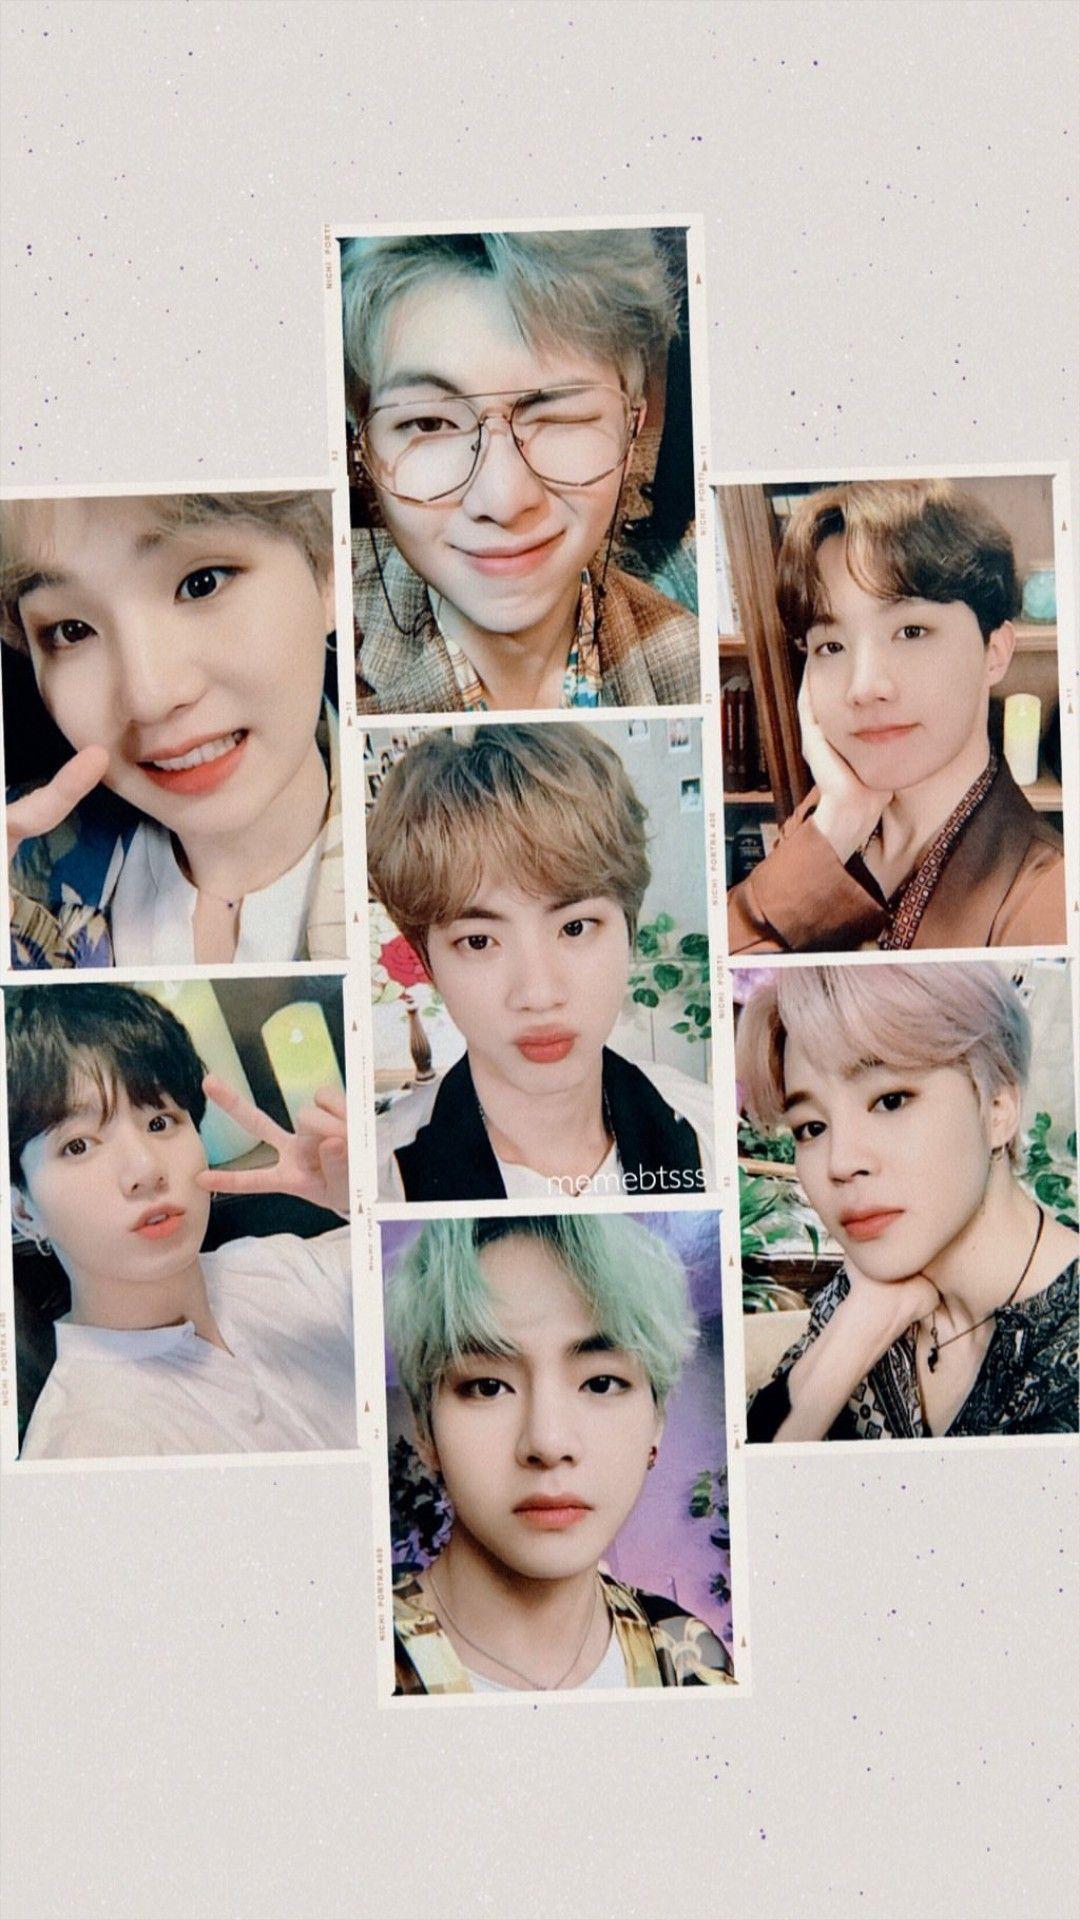 Wallpaper Lockscreen Hd Bts Cute Rm Jin Sg Jh Jm V Jk Seokjin Namjoon Taehyung